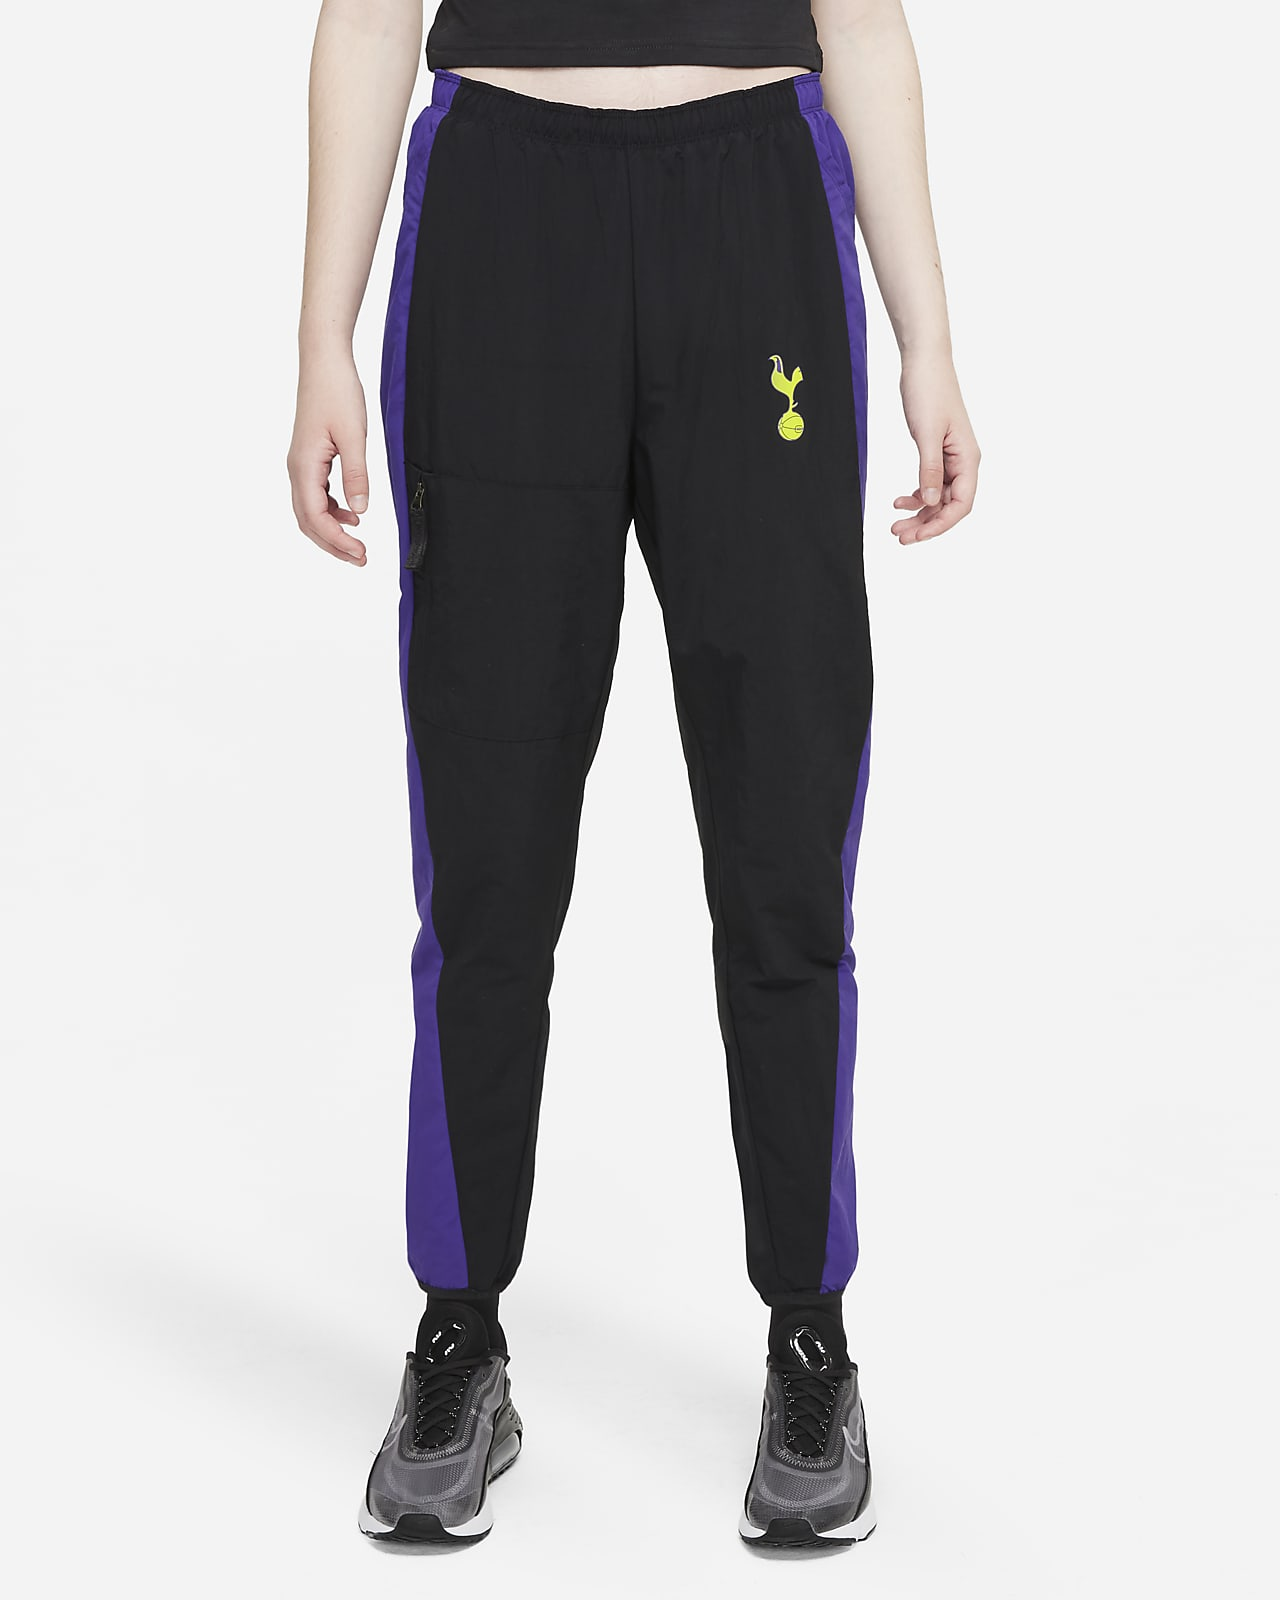 Damskie spodnie piłkarskie Nike Dri-FIT Tottenham Hotspur